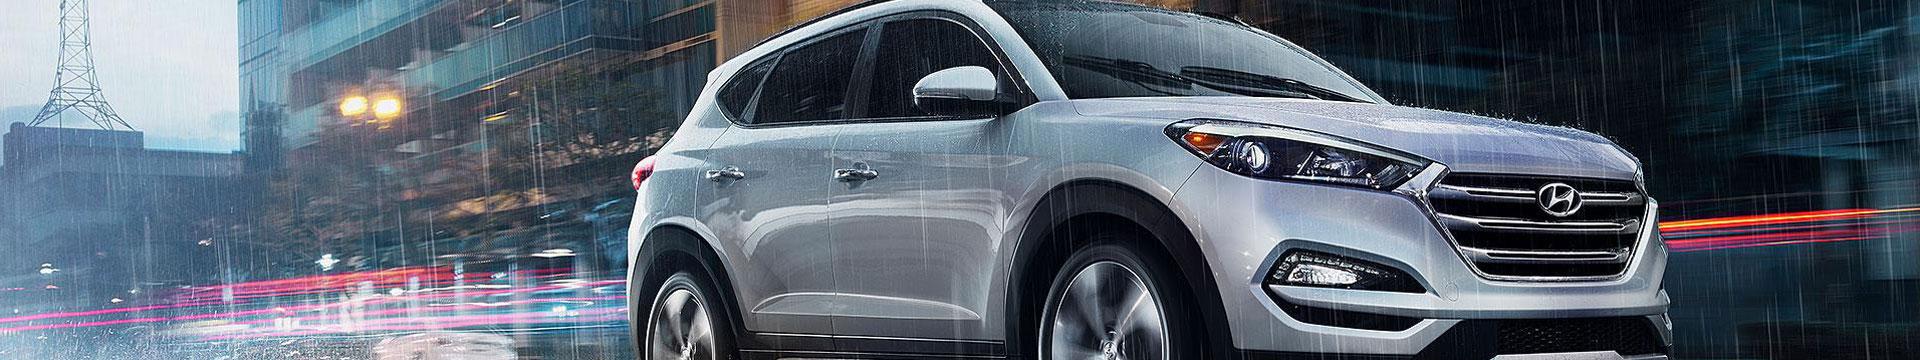 Hyundai Tire Balance Service; Subaru Service Downey CA